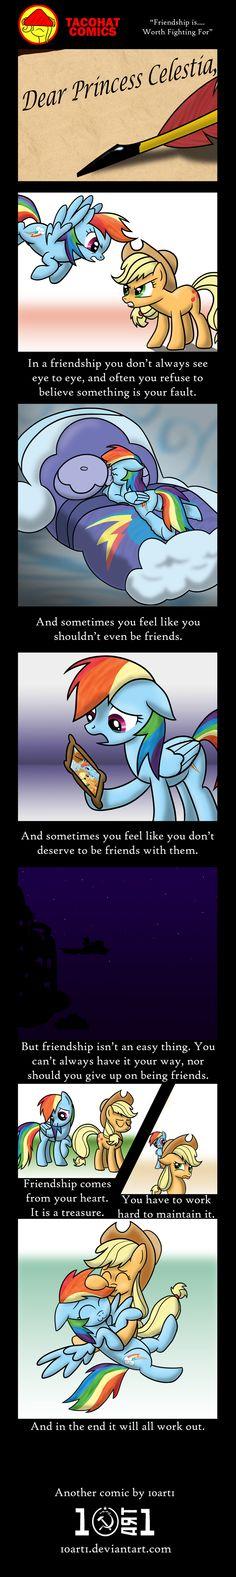 Friendship Is... Worth Fighting For by 10art1.deviantart.com on @deviantART